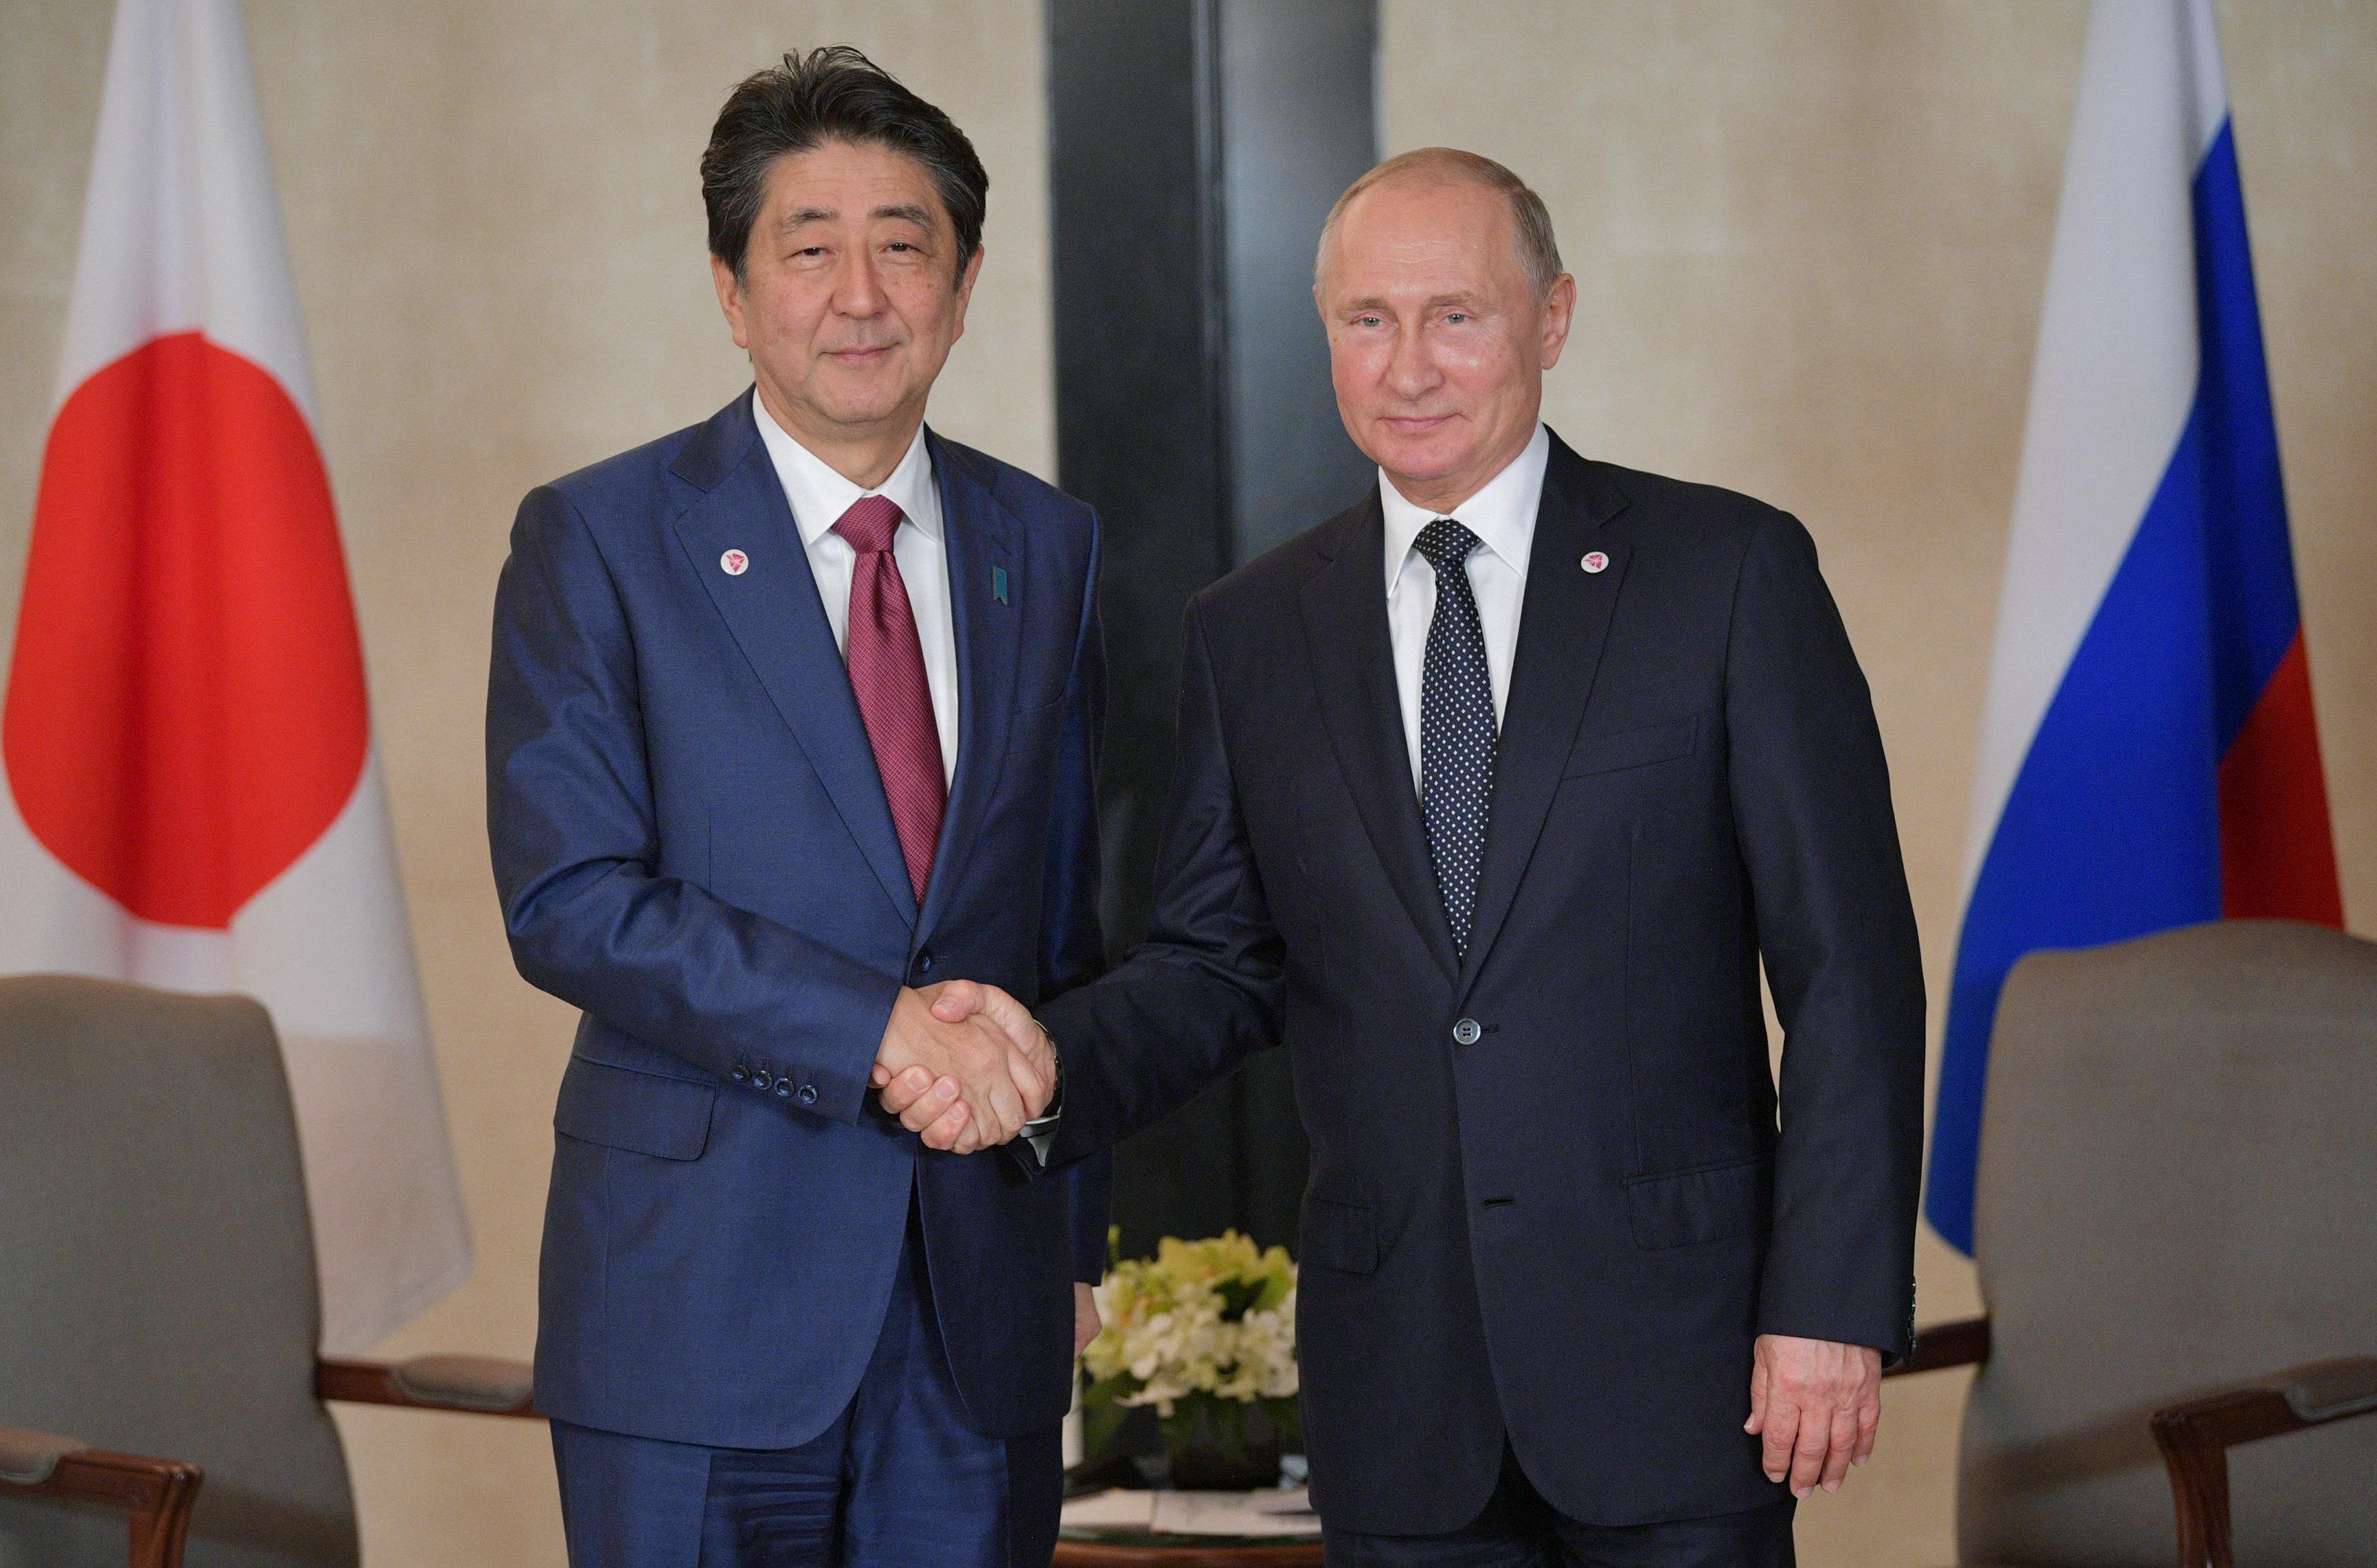 Japanese Prime Minister Shinzo Abe and Russian President Vladimir Putin attend a meeting on the sidelines of the ASEAN-Russia Summit in Singapore, November 14, 2018. Sputnik/Alexei Druzhinin/Kremlin via REUTERS